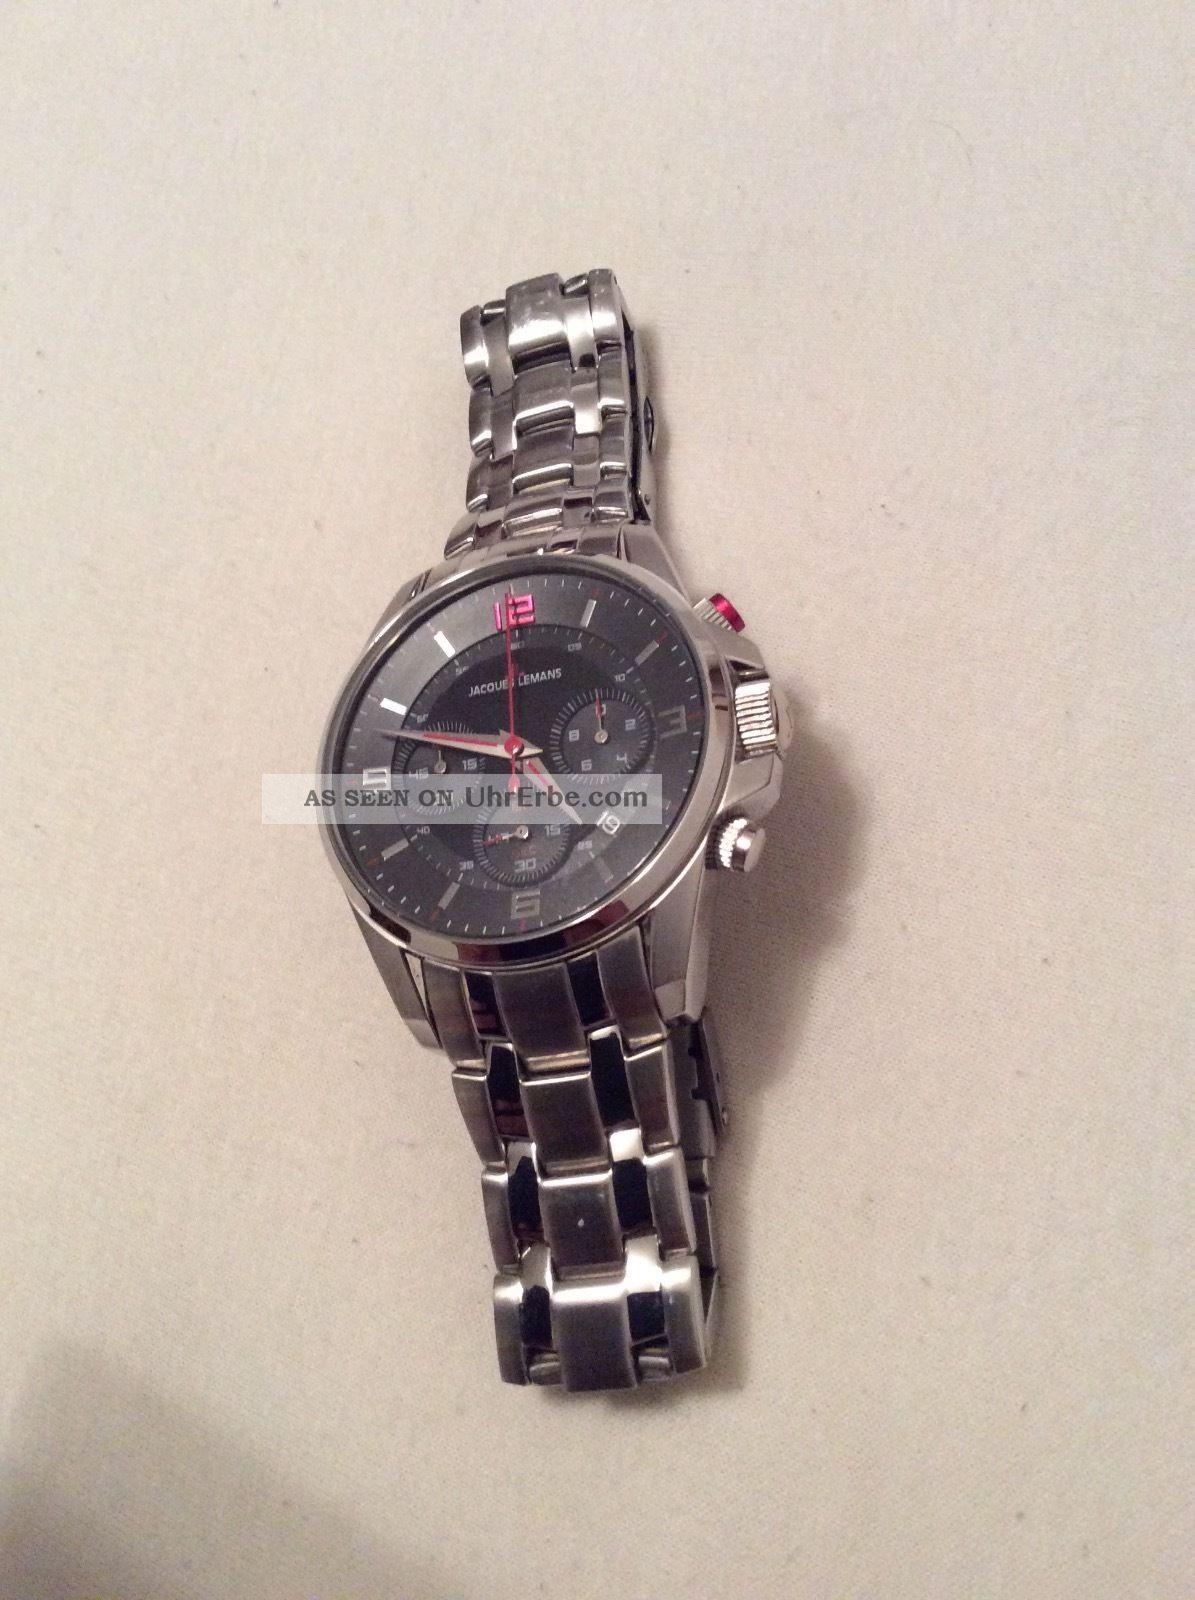 Jacques Lemans Herren - Armbanduhr Xl Liverpool Chronograph Quarz Edelstahl 1 - 167 Armbanduhren Bild